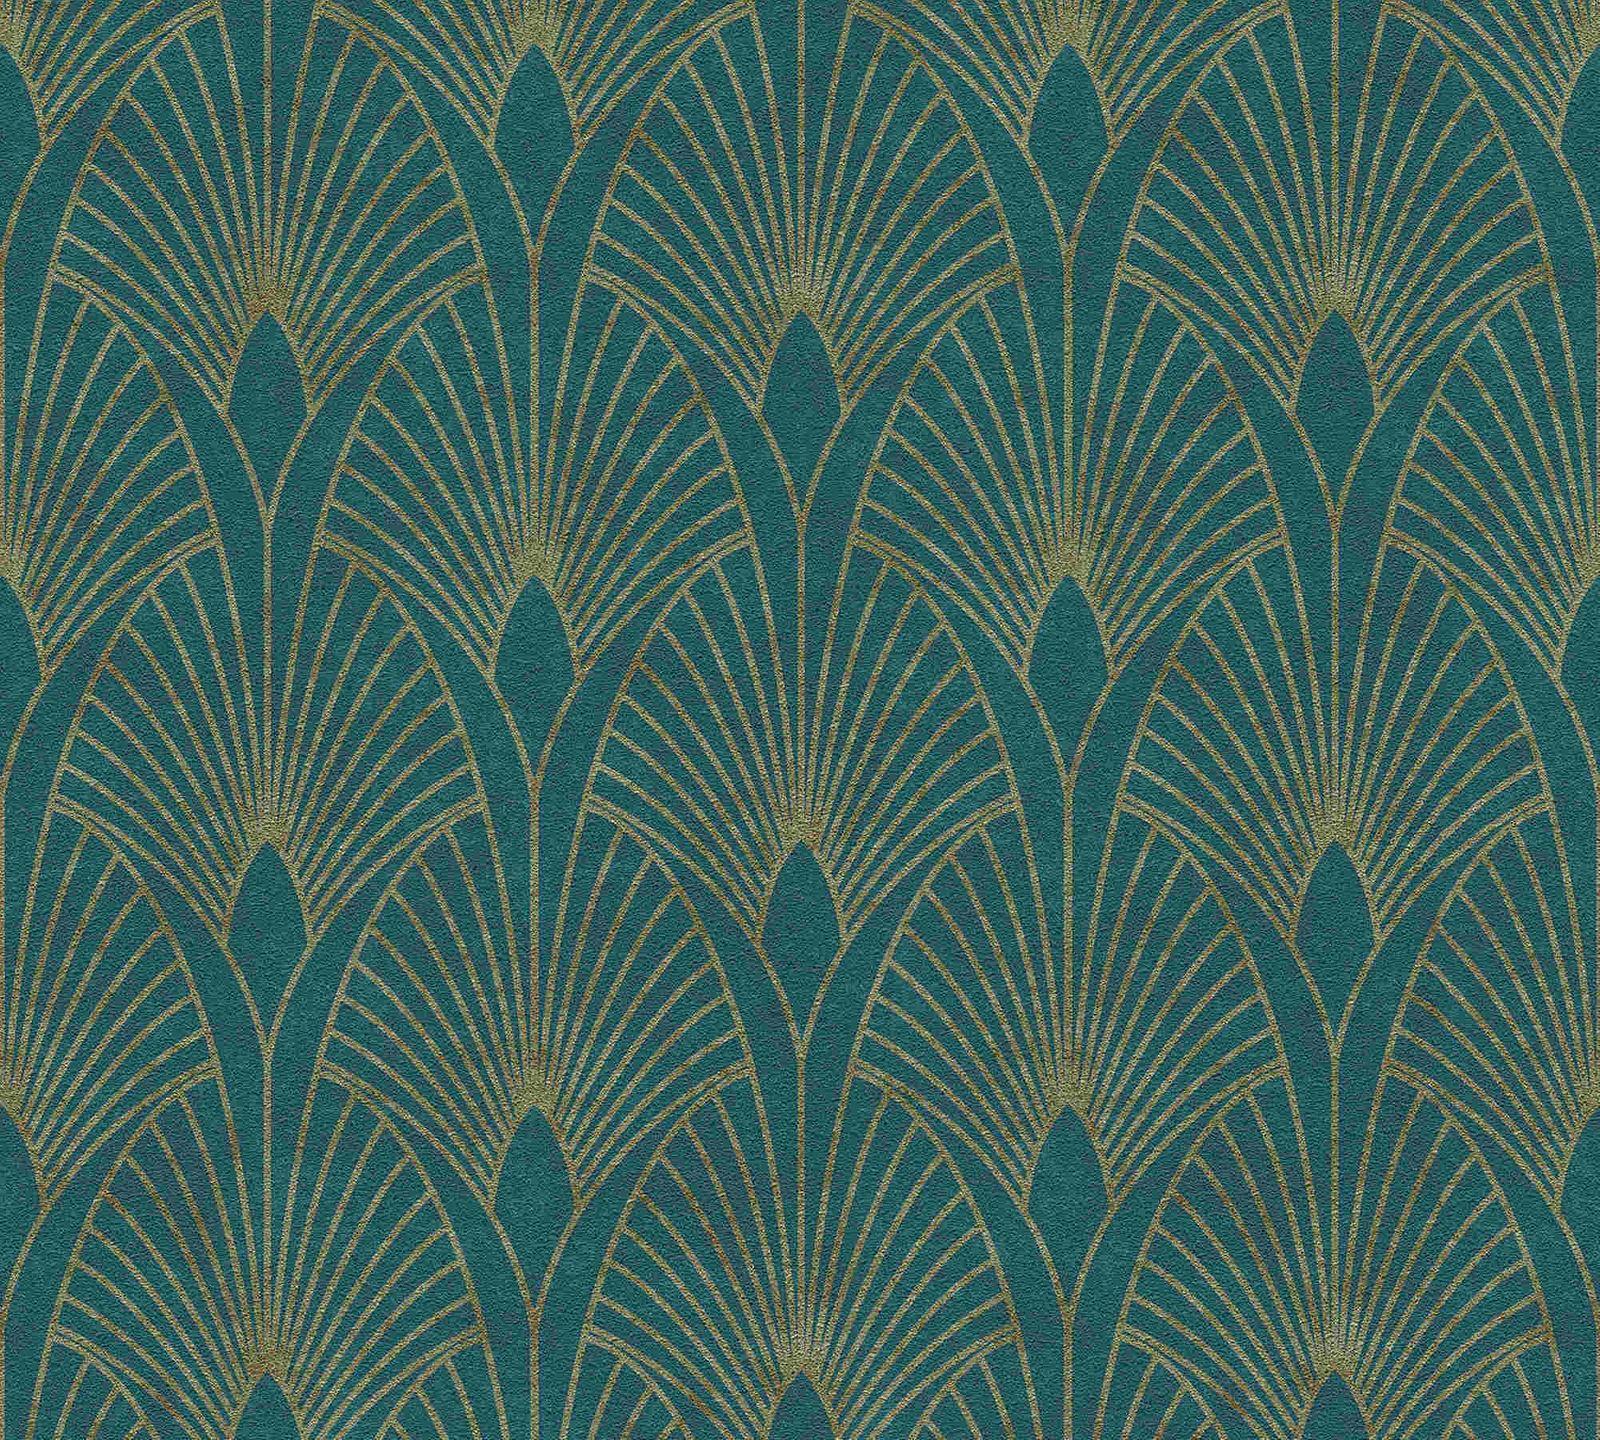 Esprit Art Deco Com non-woven wallpaper art deco turquoise gold 37427-5